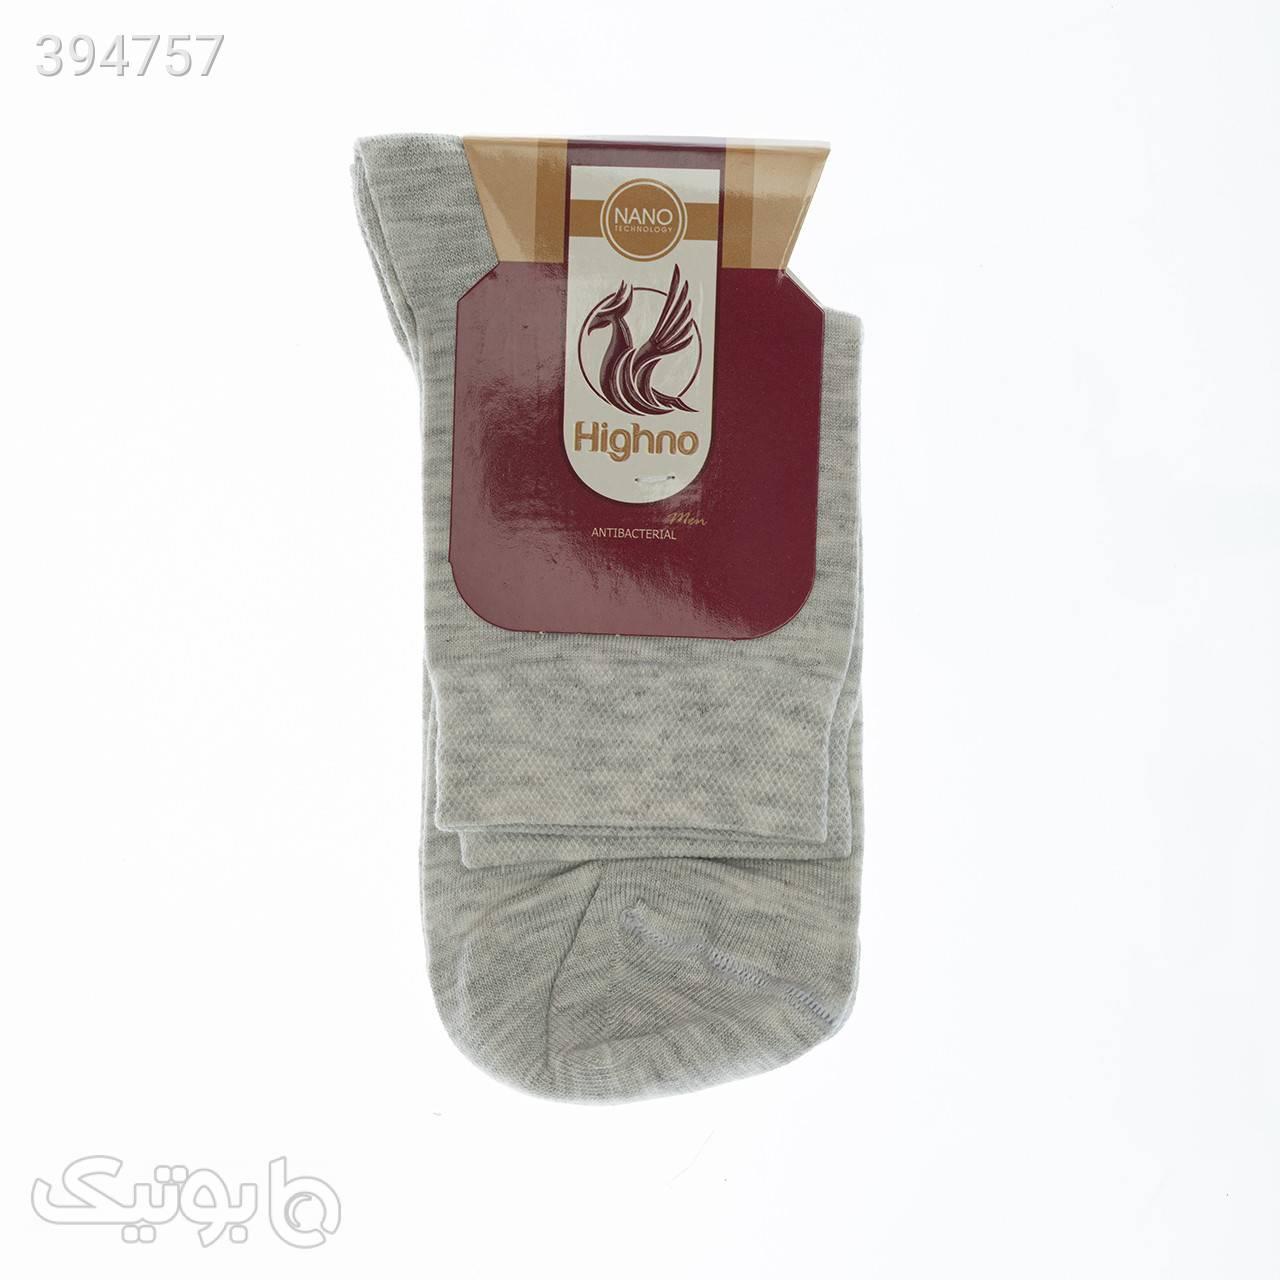 جوراب آنتی باکتریال مردانه مدل 0734-1224 طوسی جوراب و پاپوش